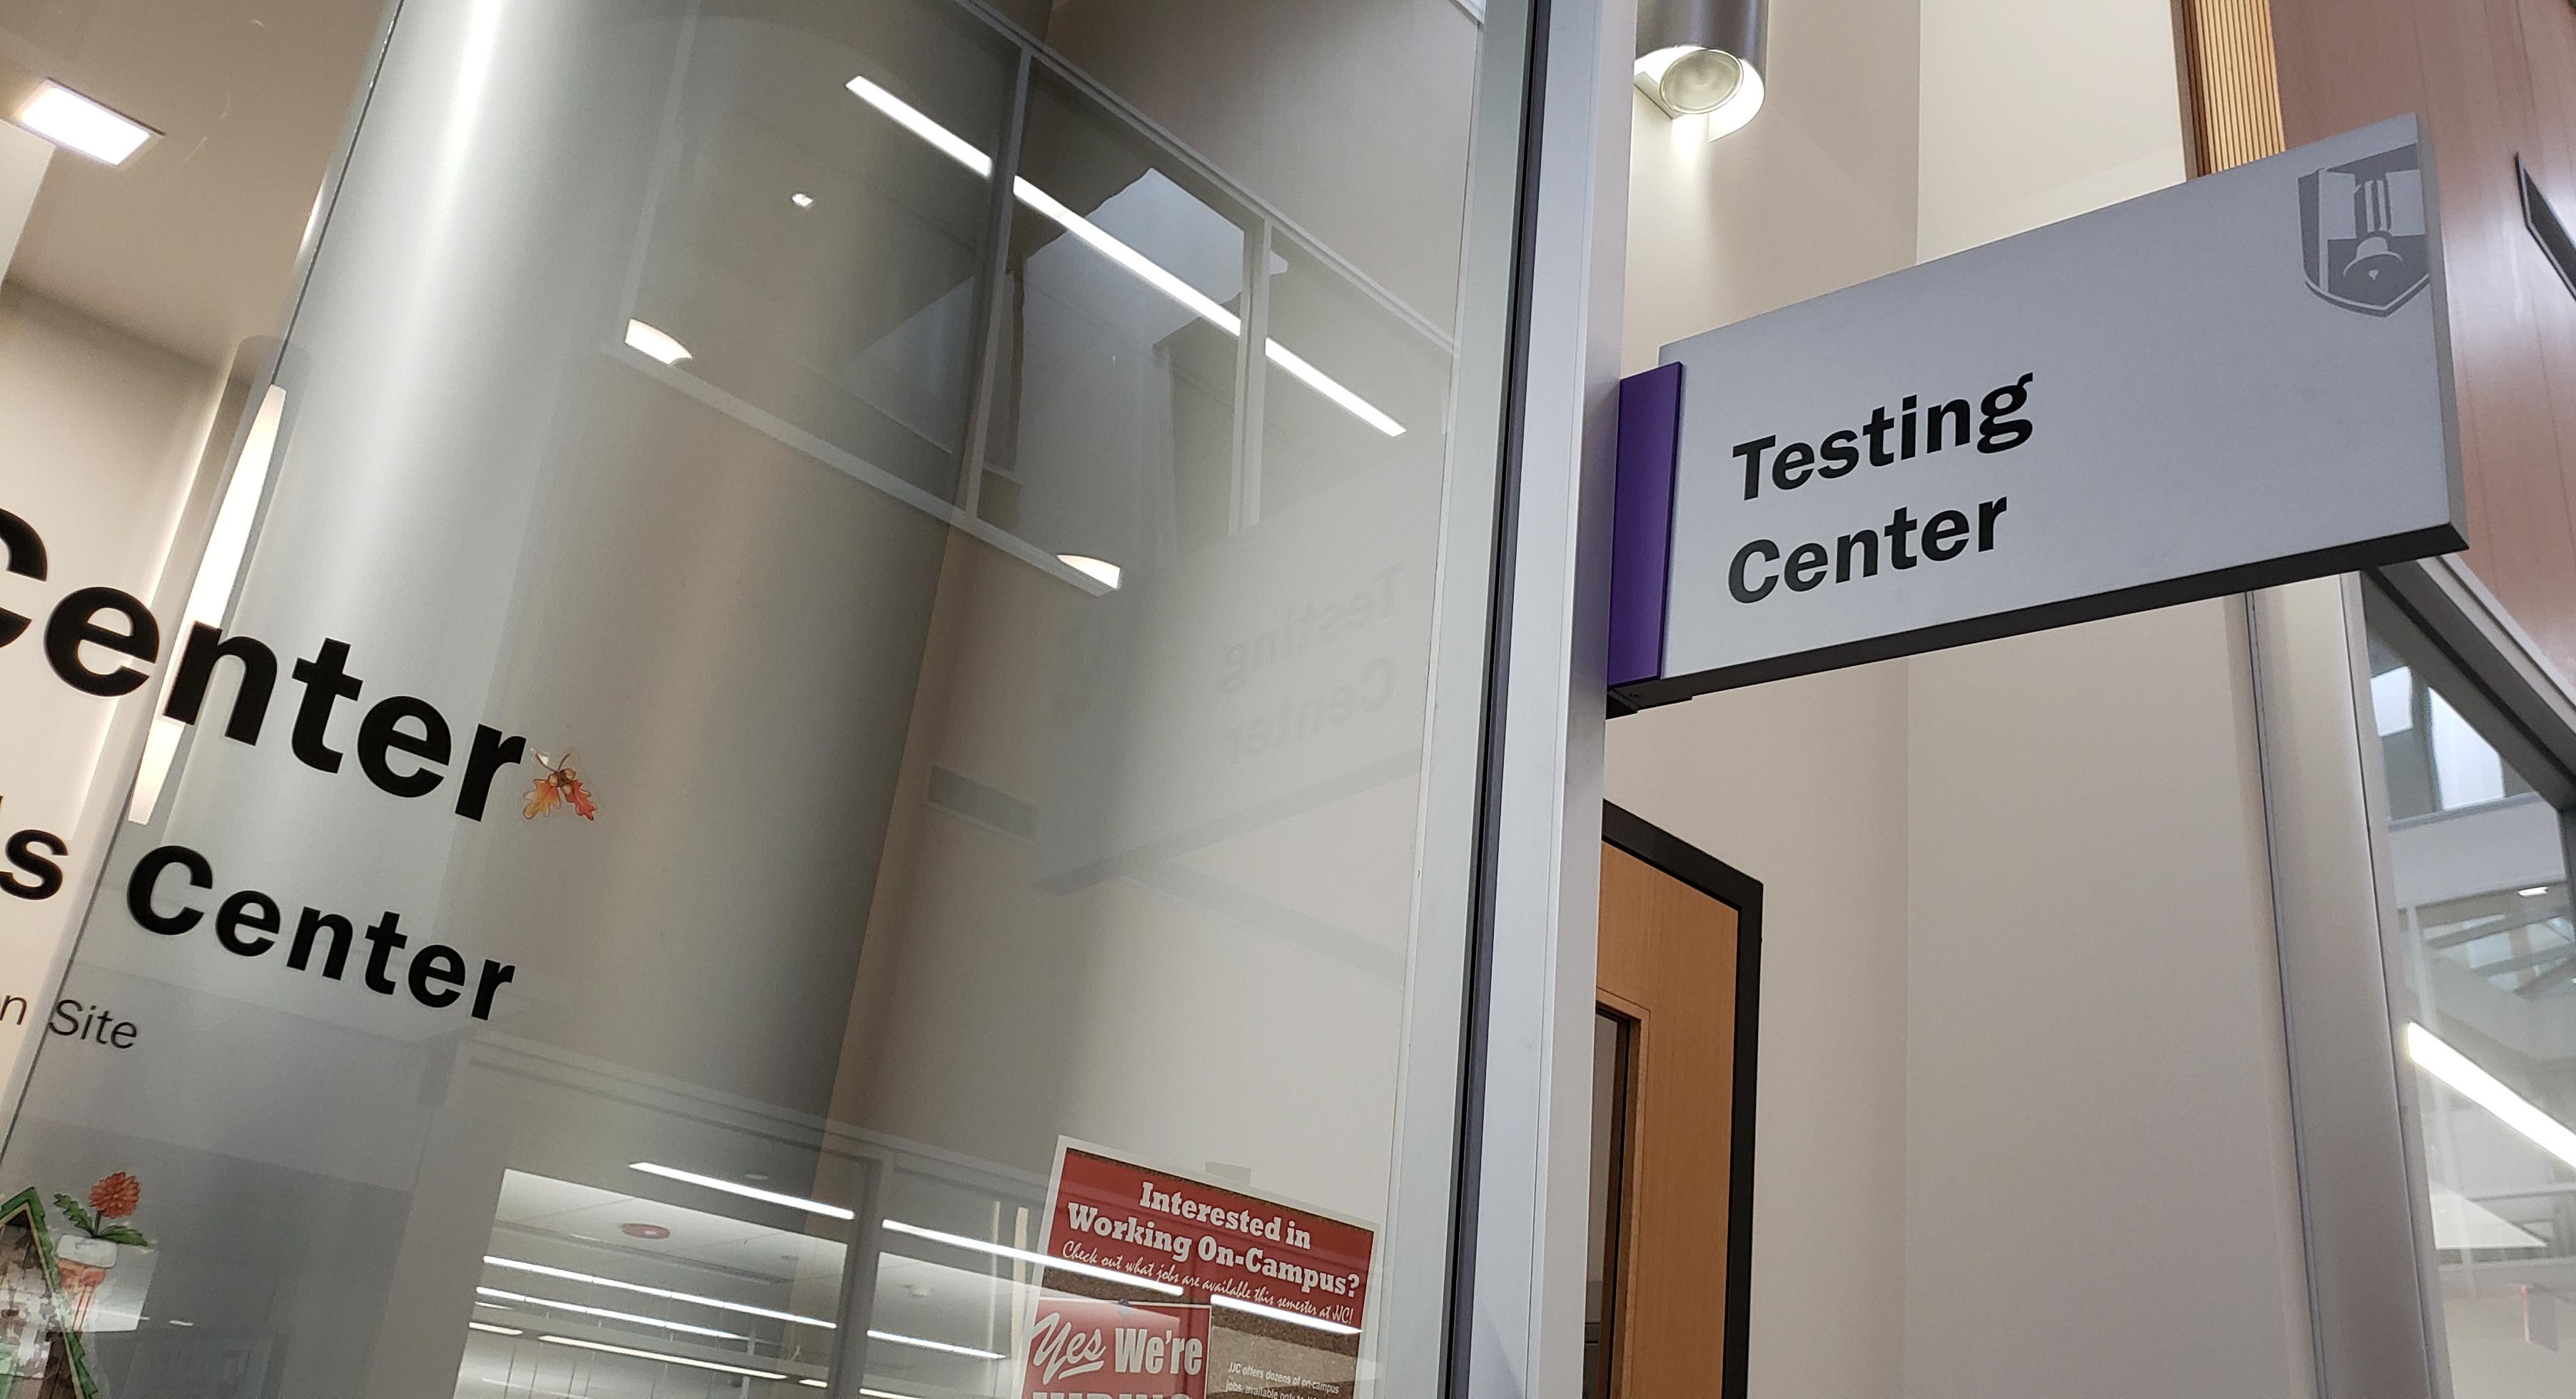 testingcenter1